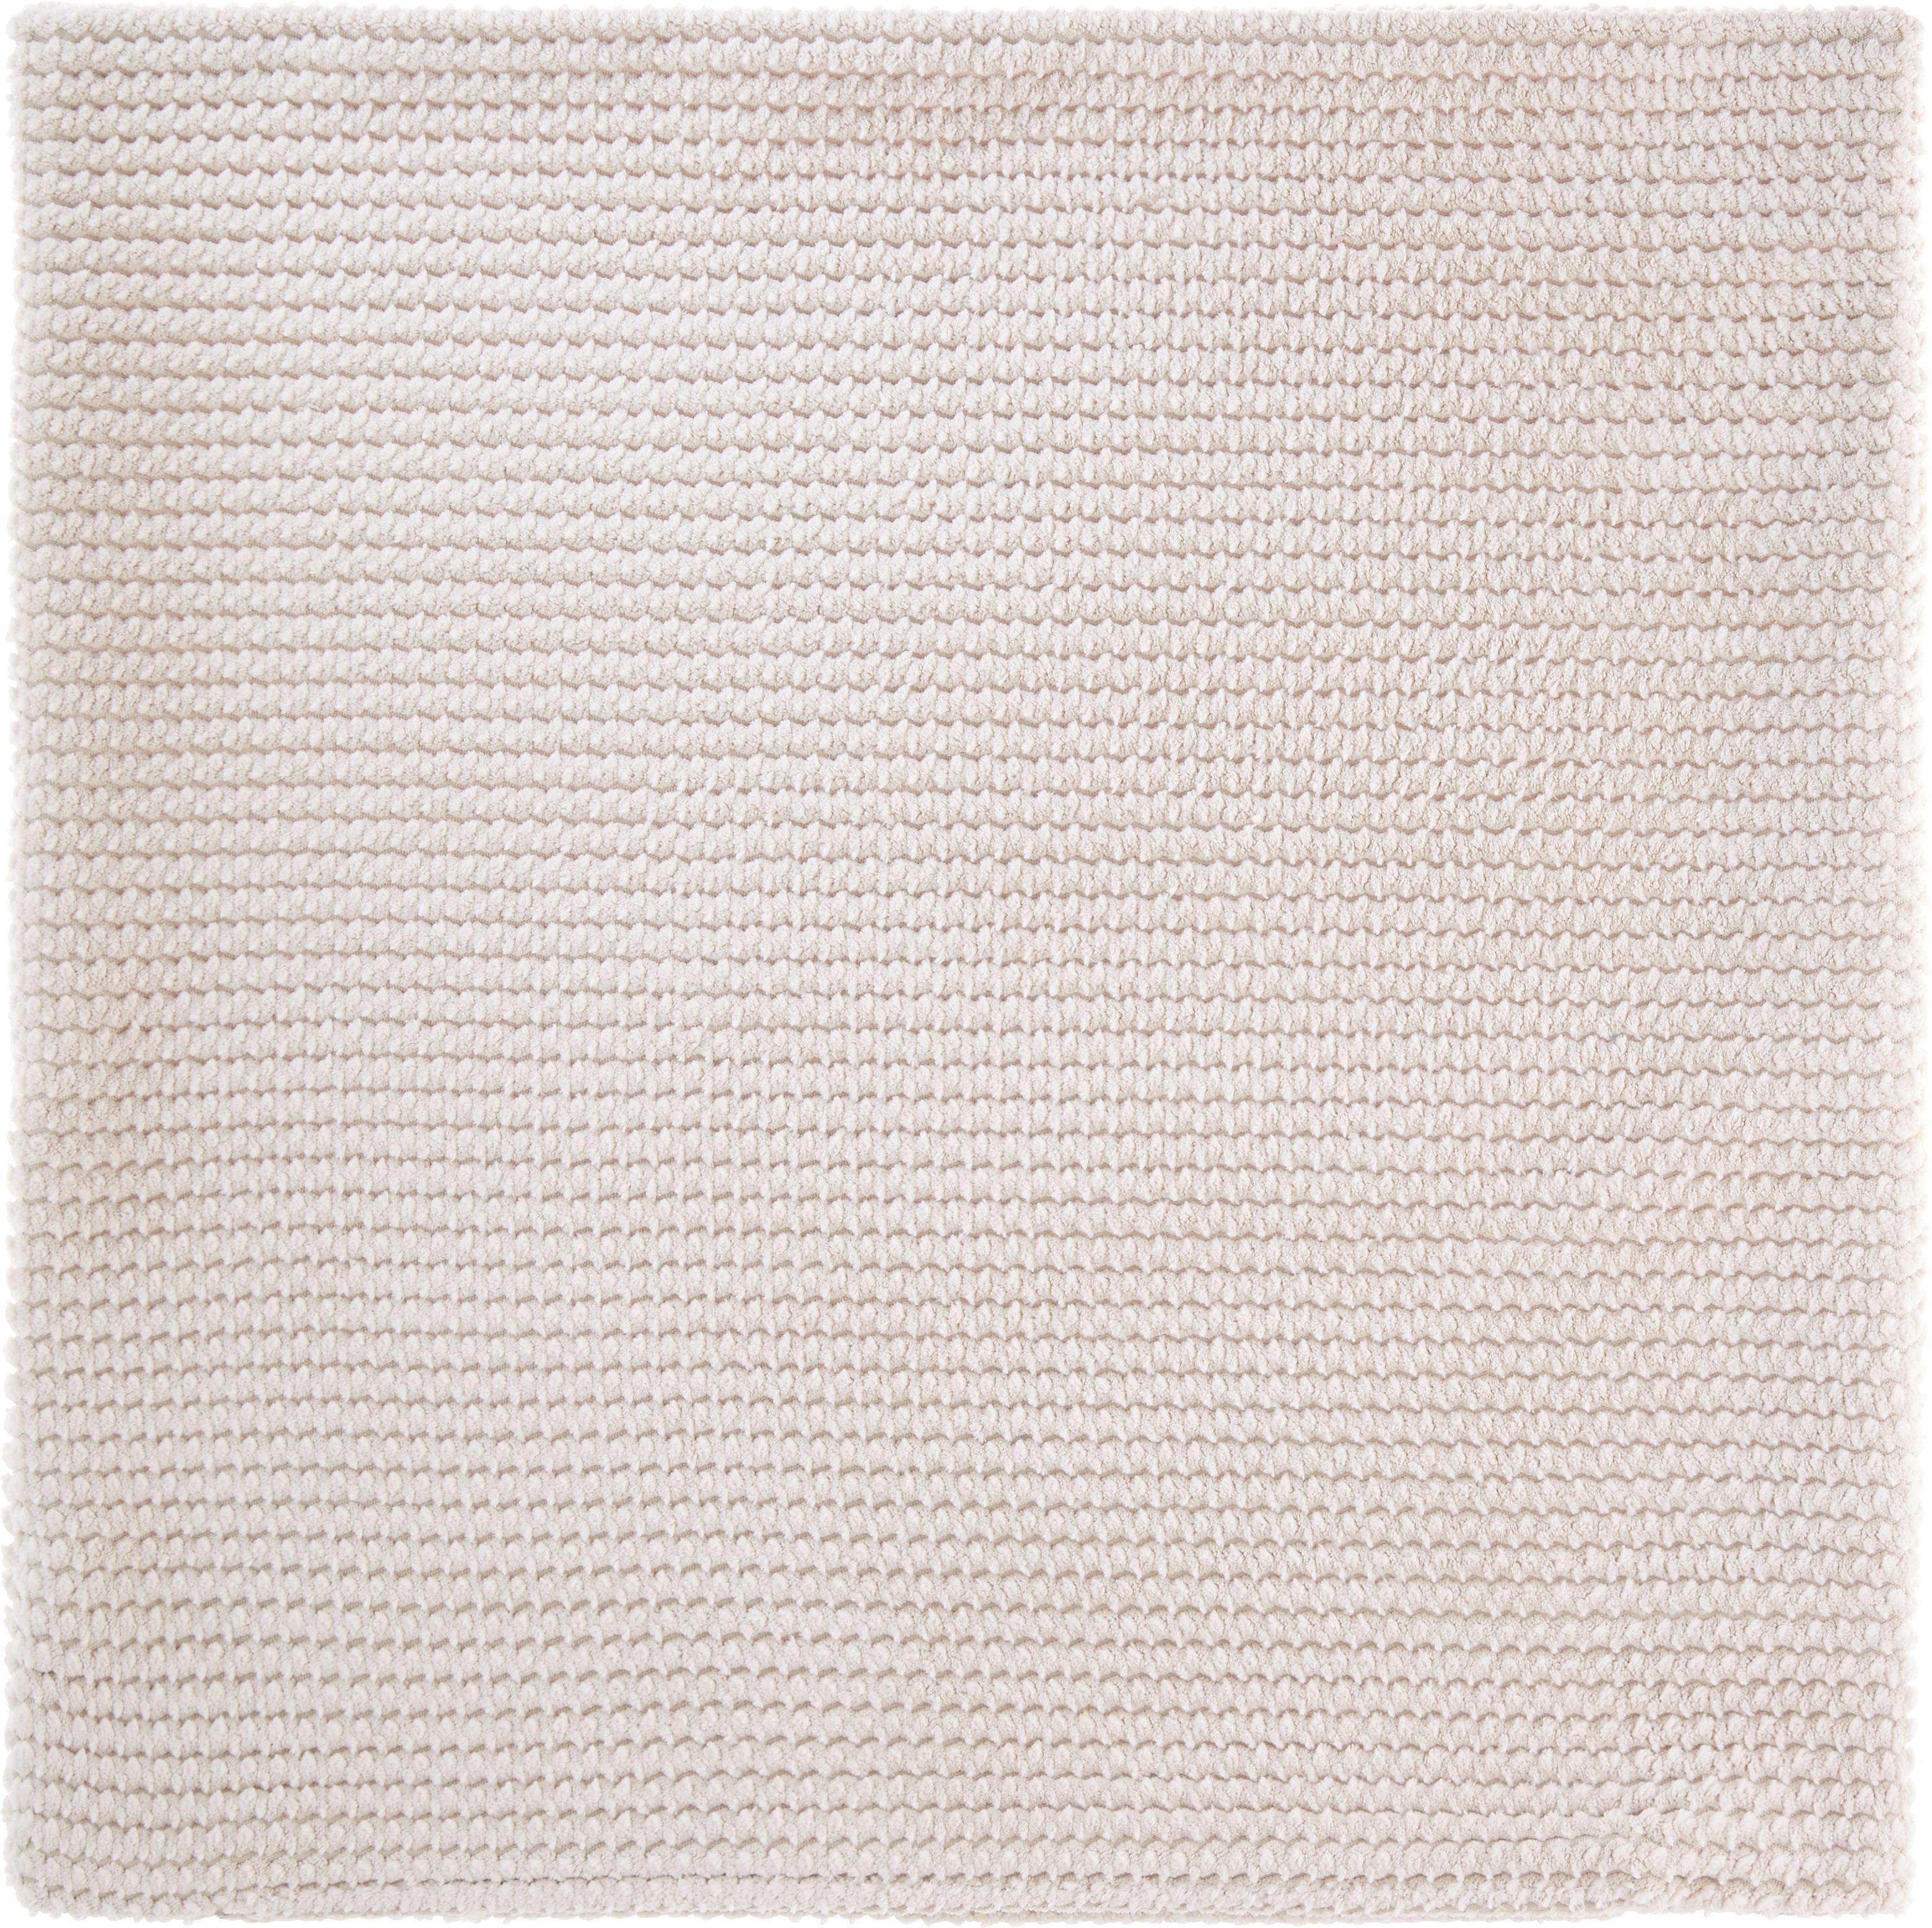 Povlak Na Polštář Maxima - pískové barvy, Konvenční, textil (50/50cm) - MÖMAX modern living